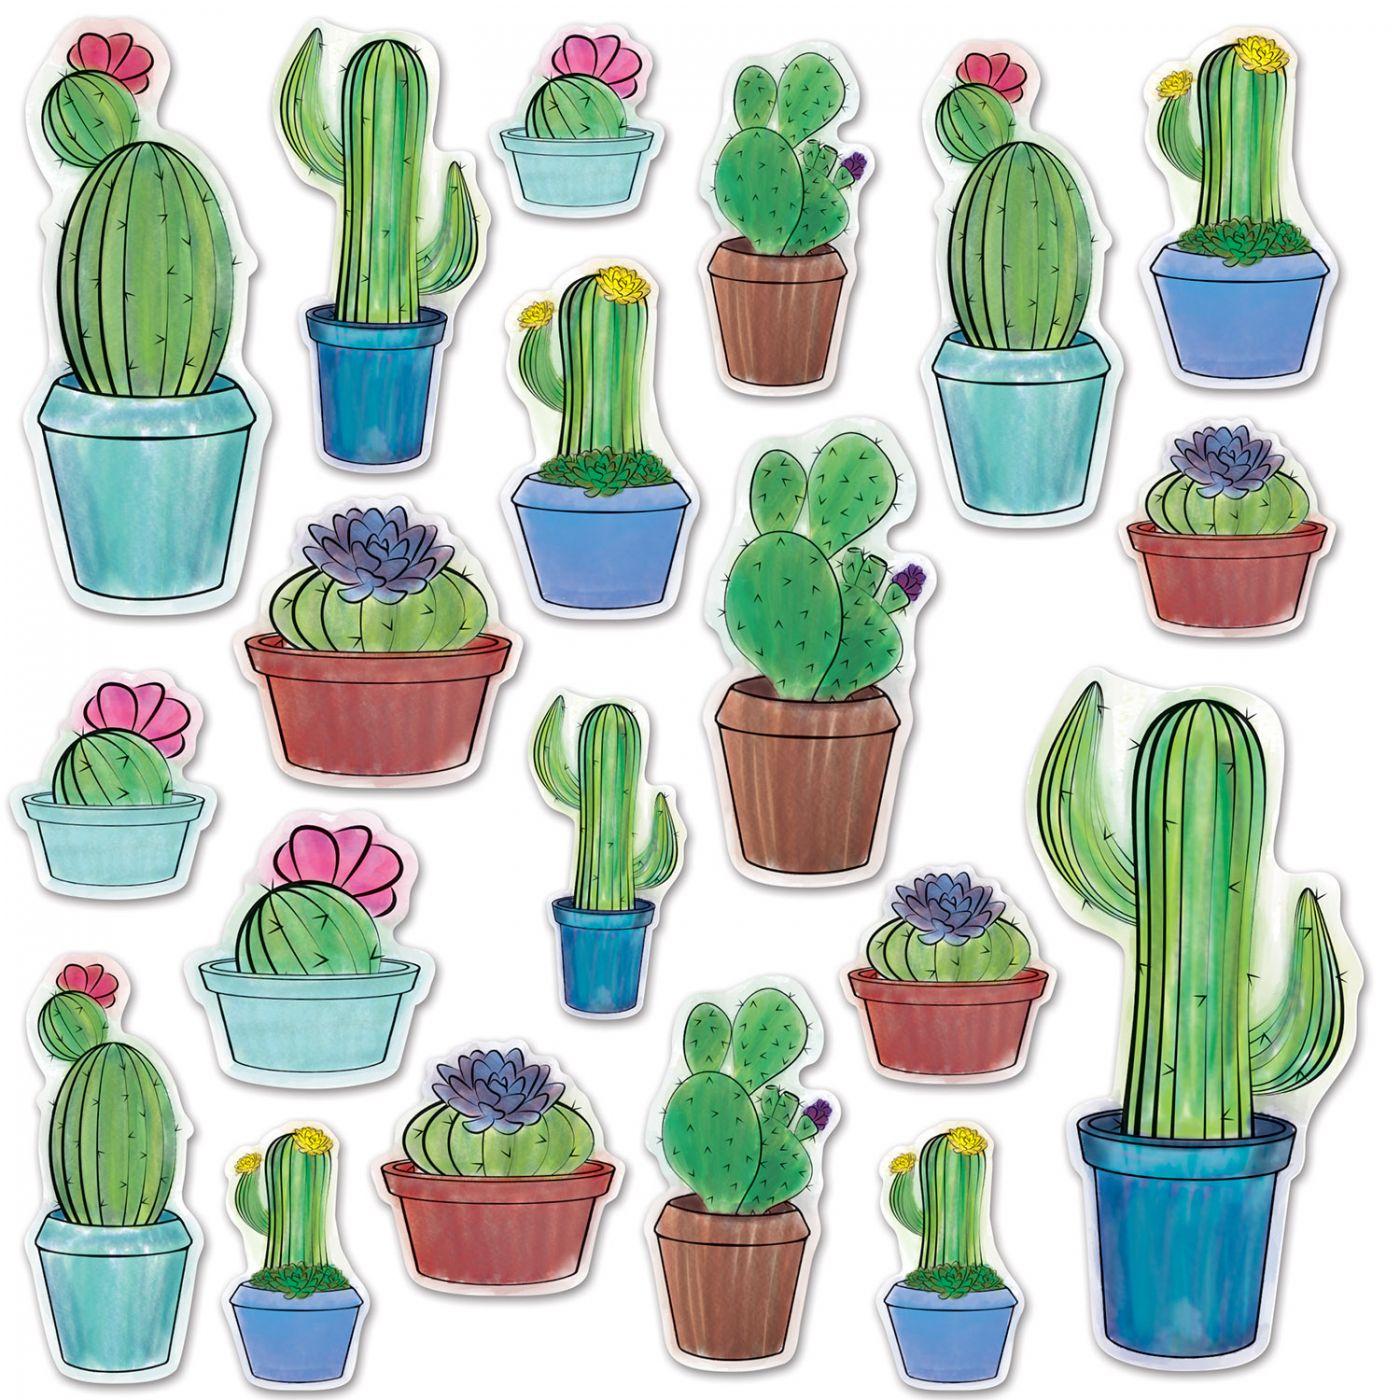 Cactus Cutouts image